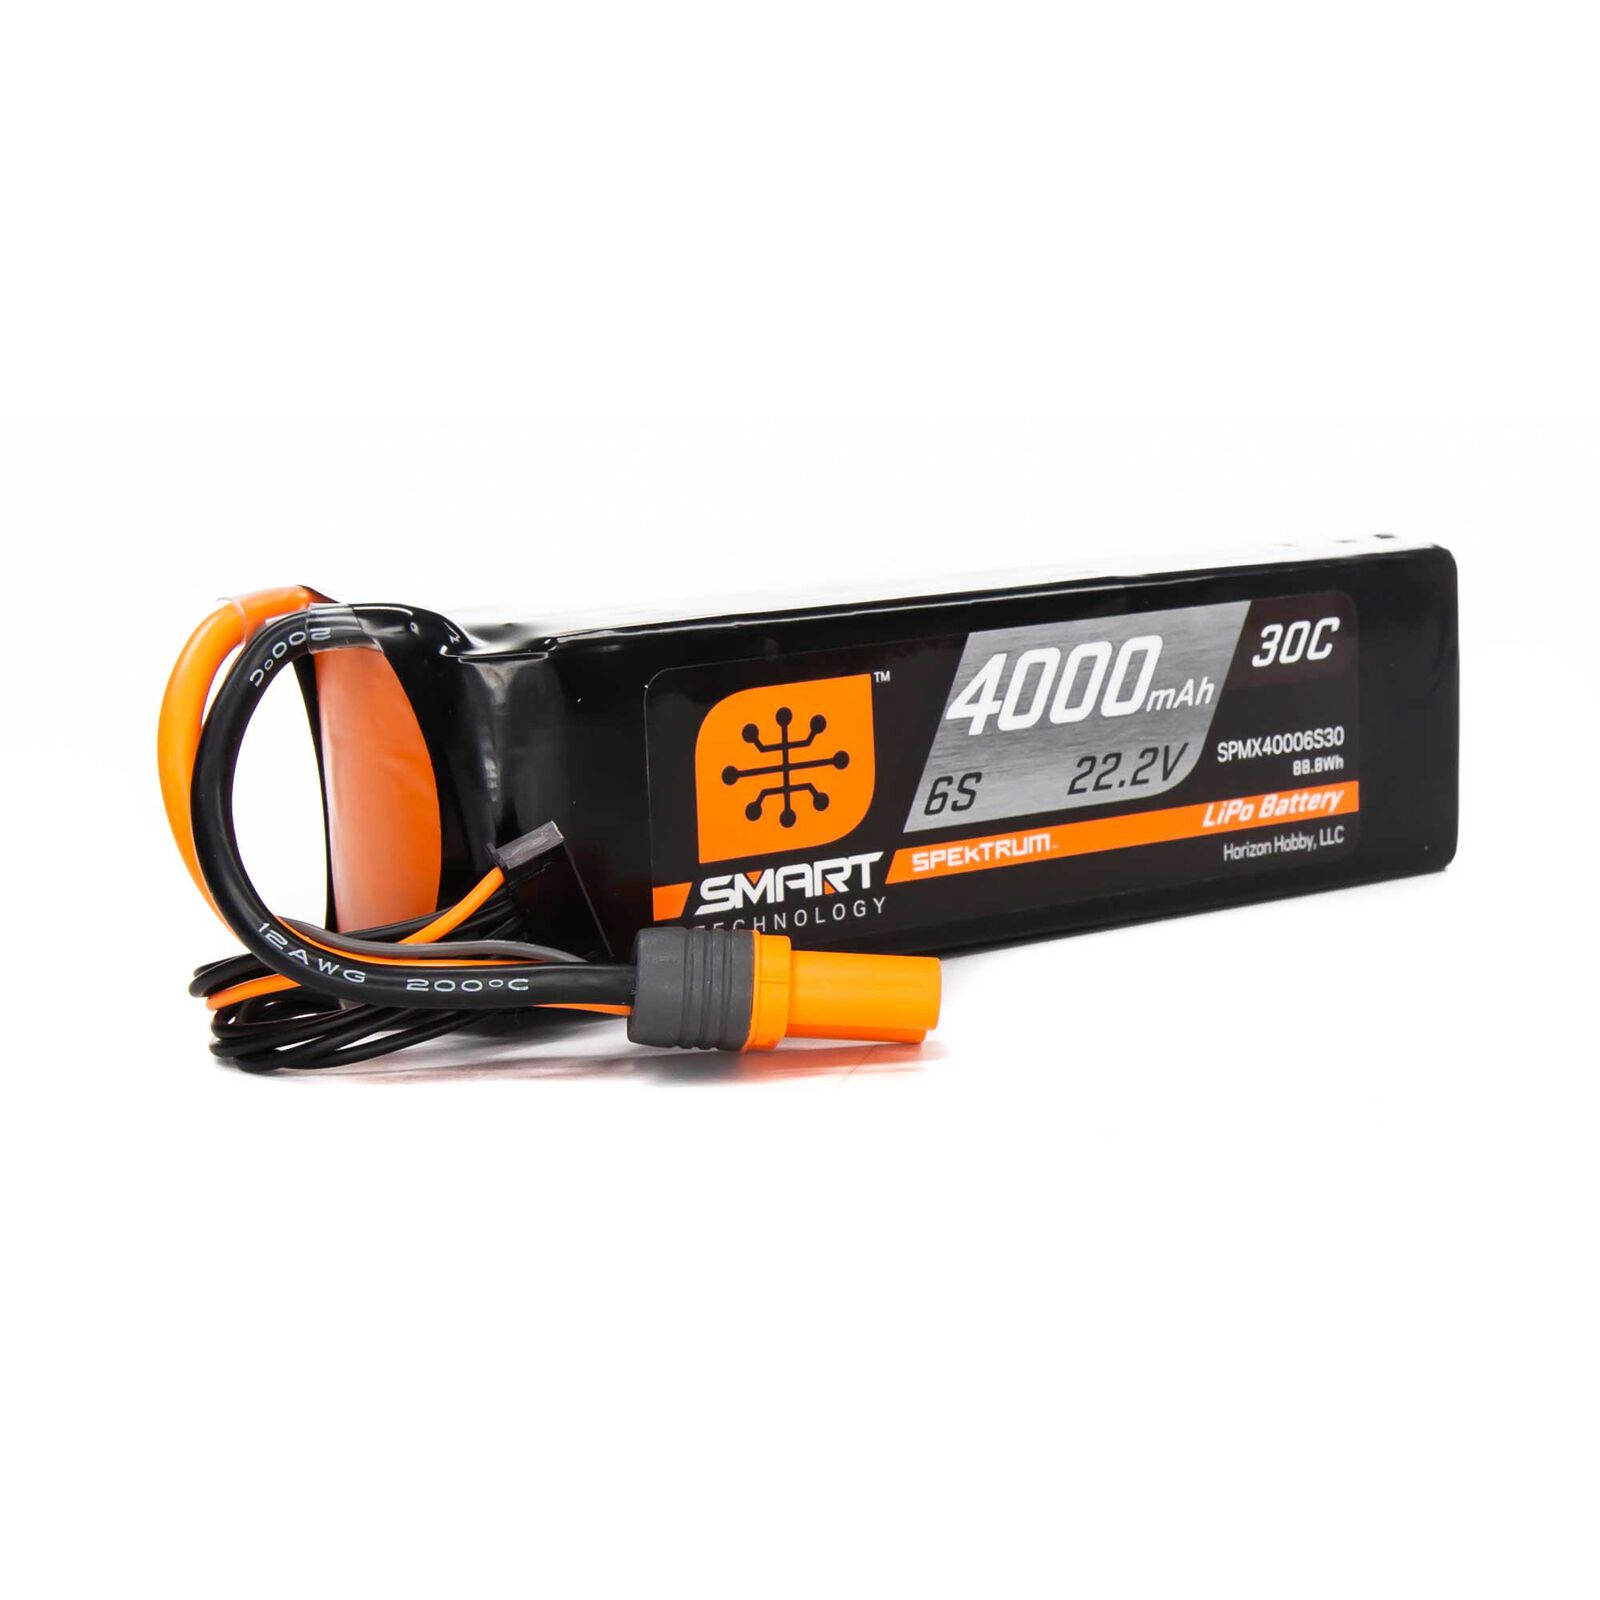 22.2V 4000mAh 6S 30C Smart LiPo Battery, IC5